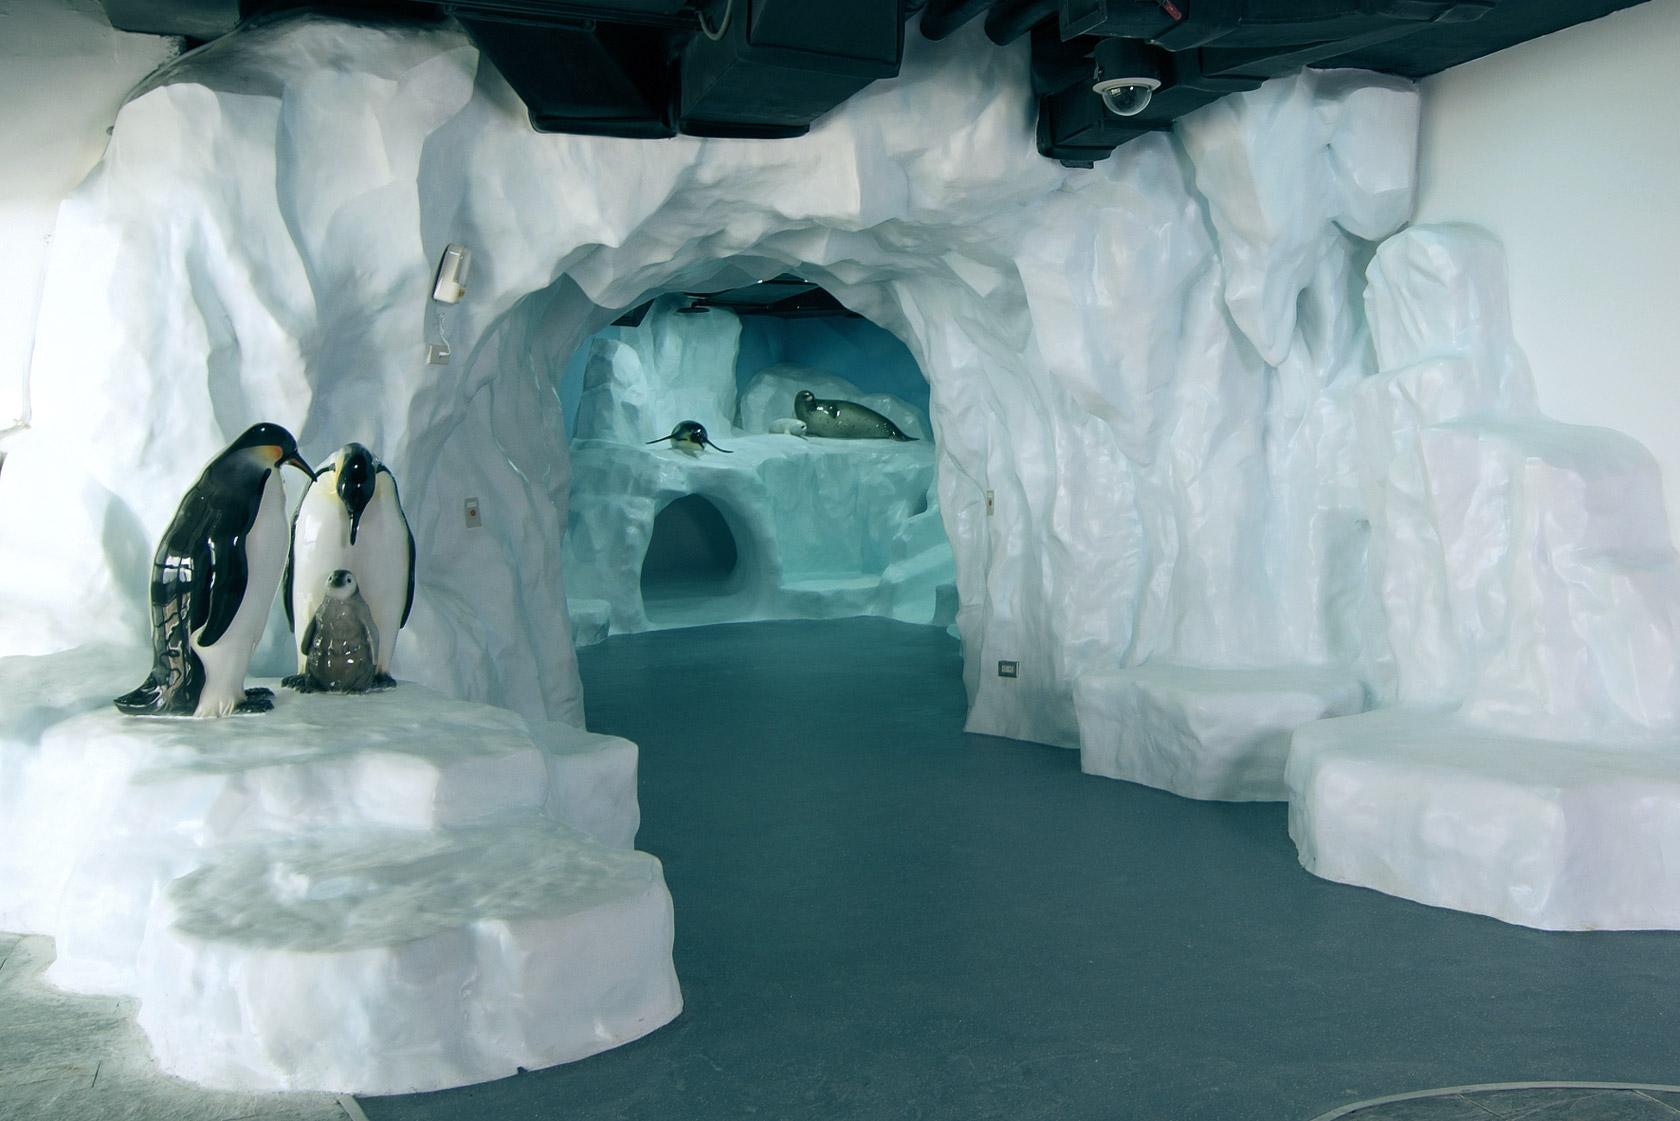 Adventure in the Polar Region